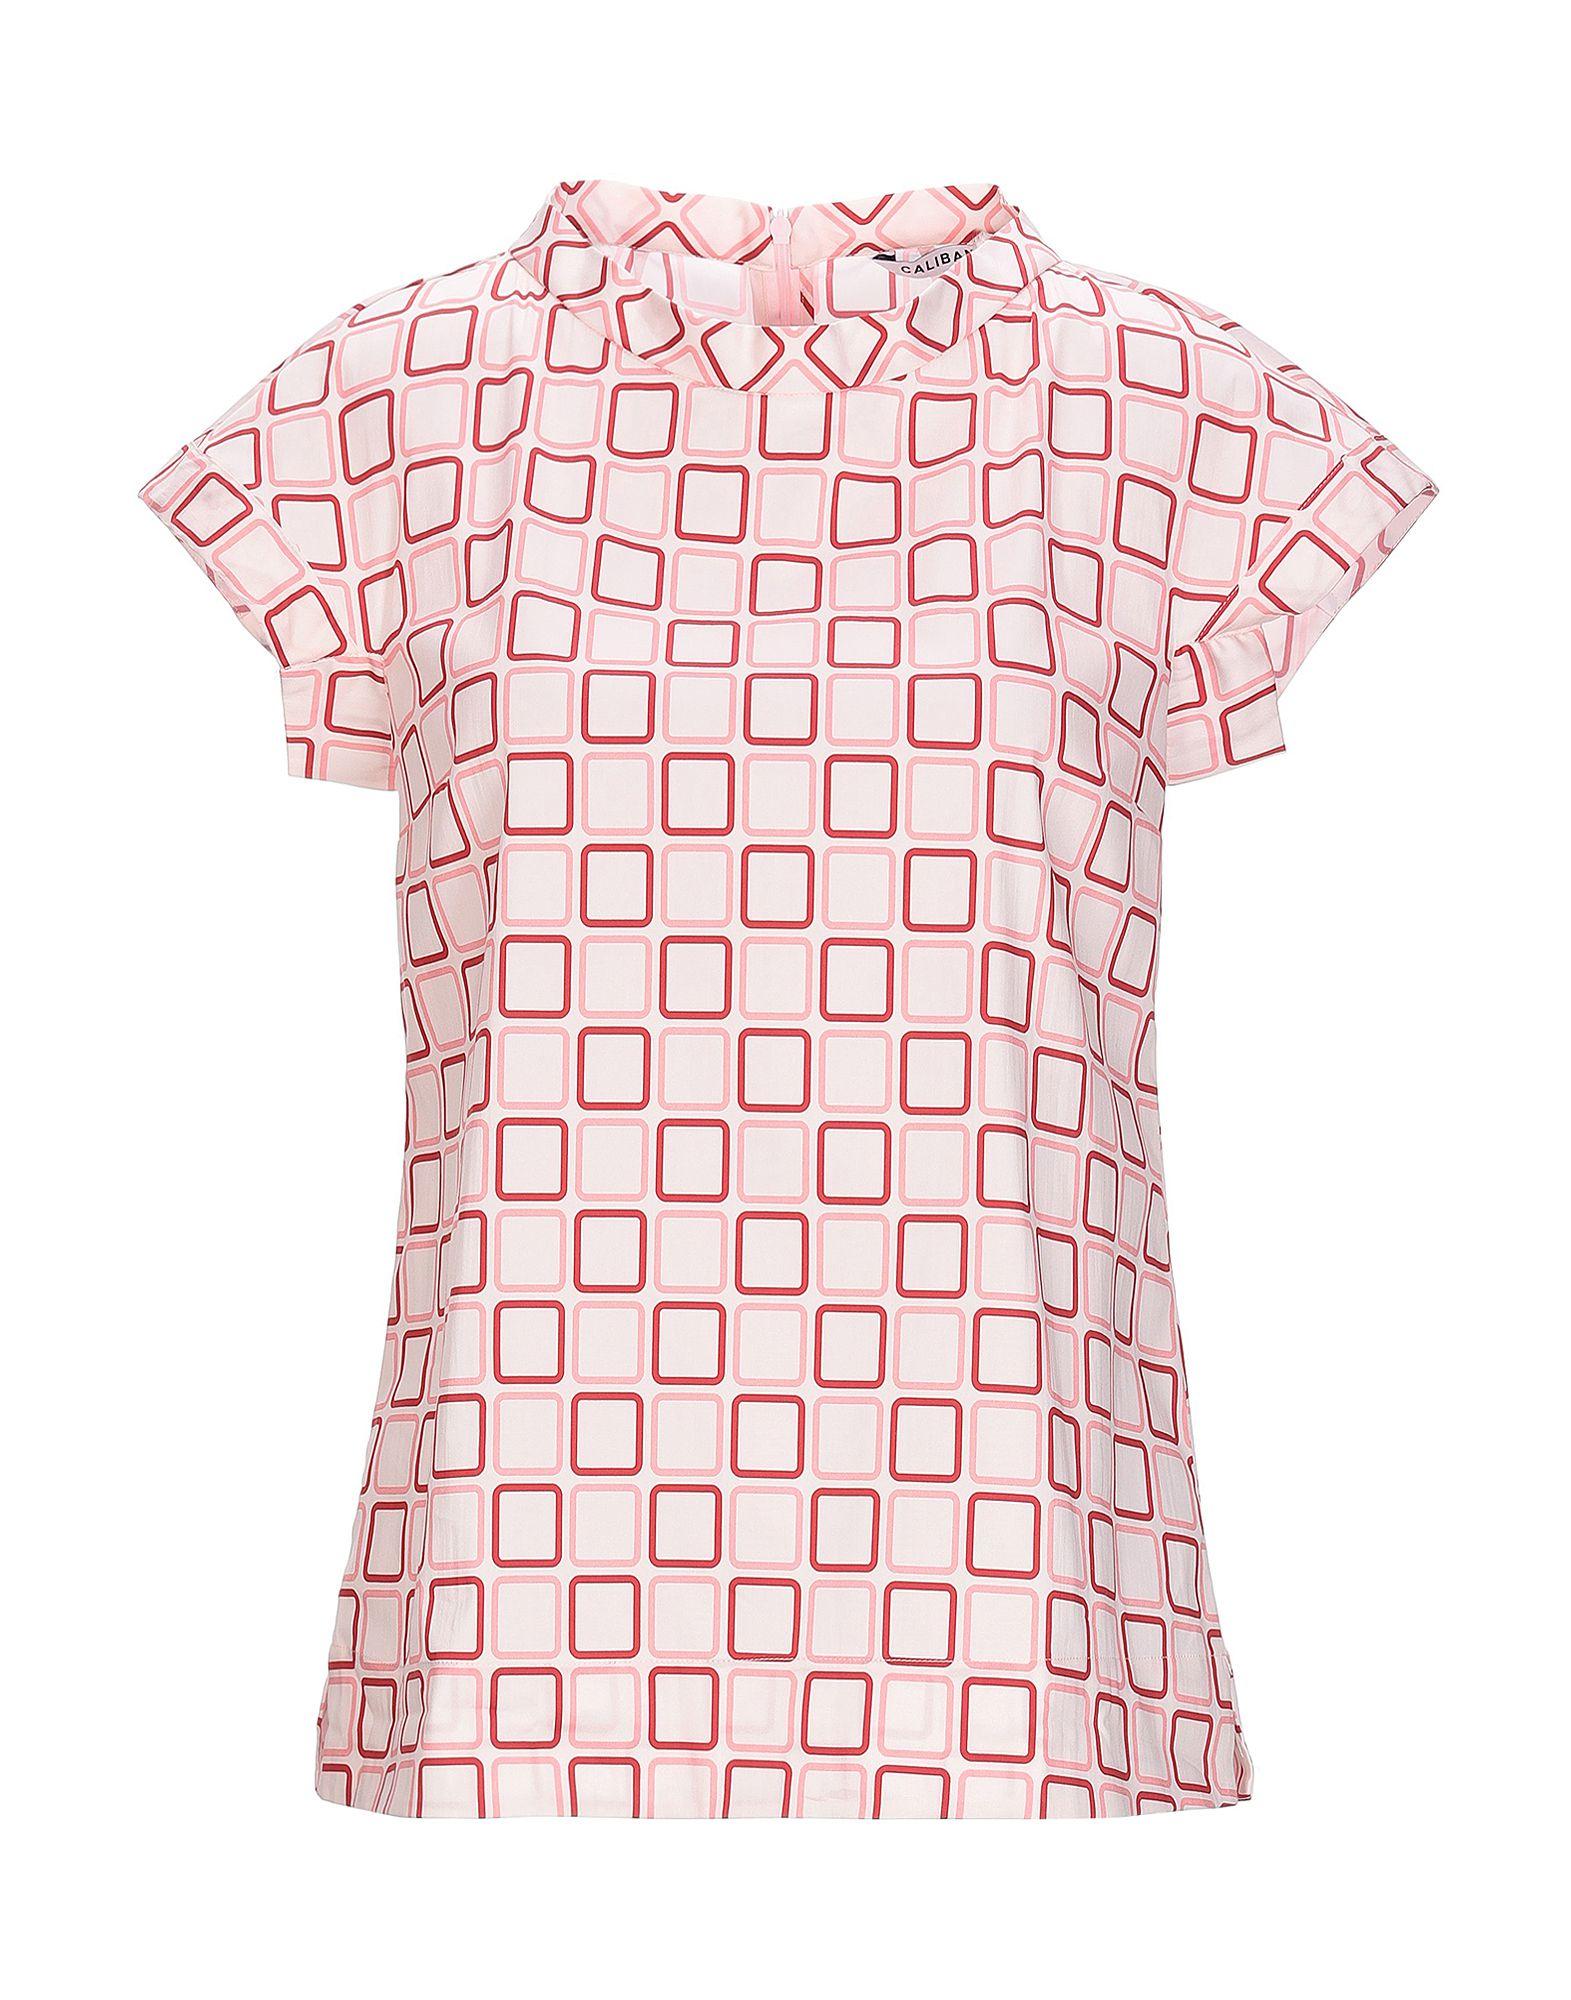 CALIBAN Блузка блузка с рисунком короткие рукава вырез сзади